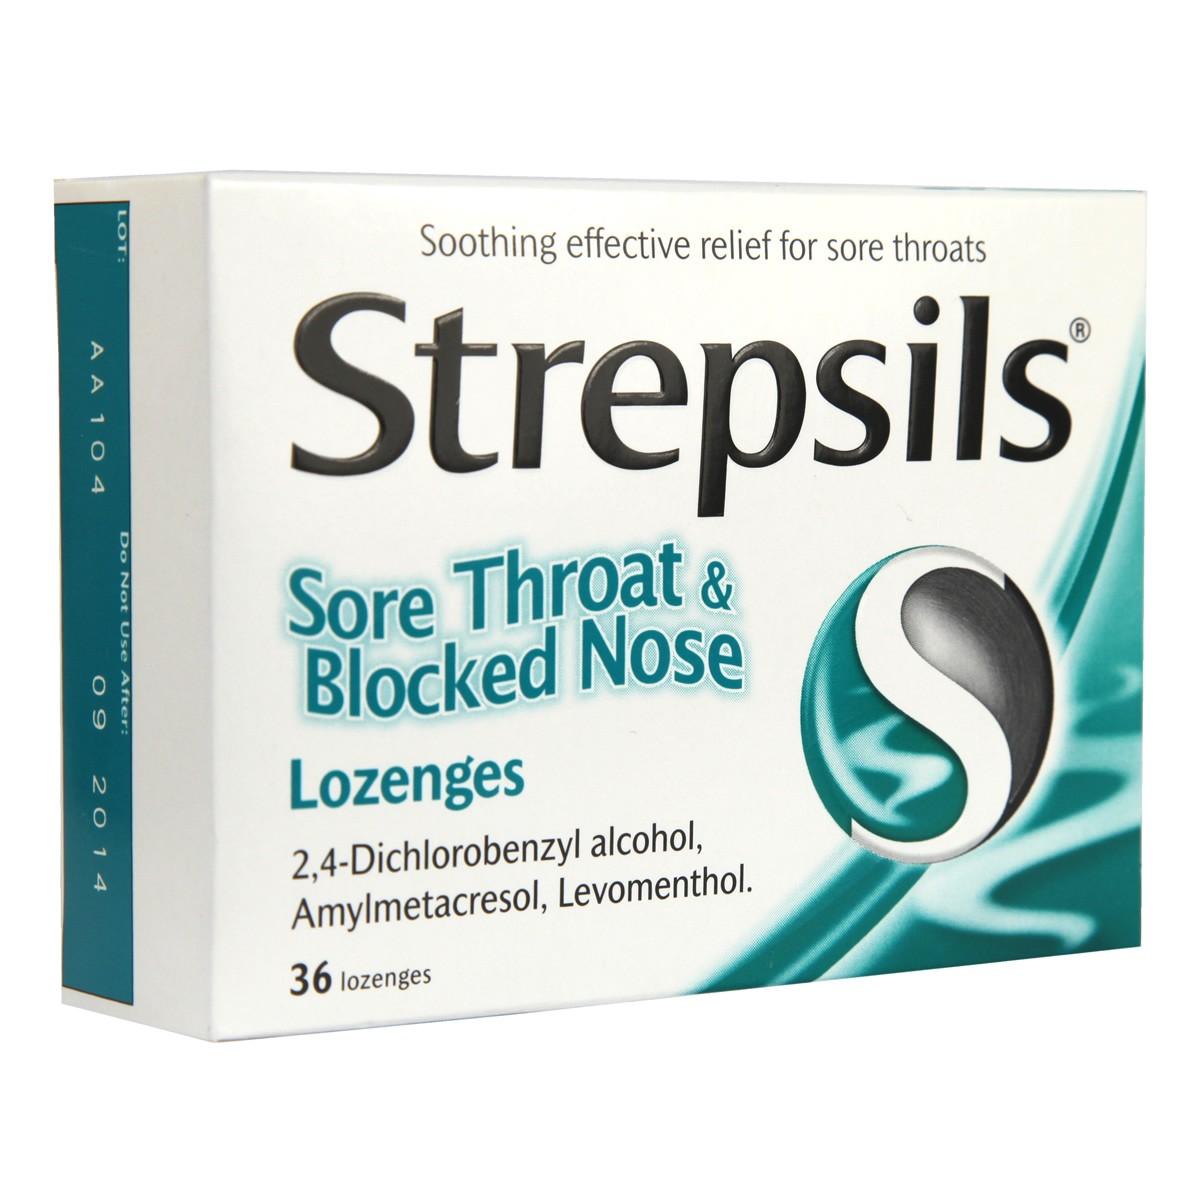 Strepsils Sore Throat & Blocked Nose